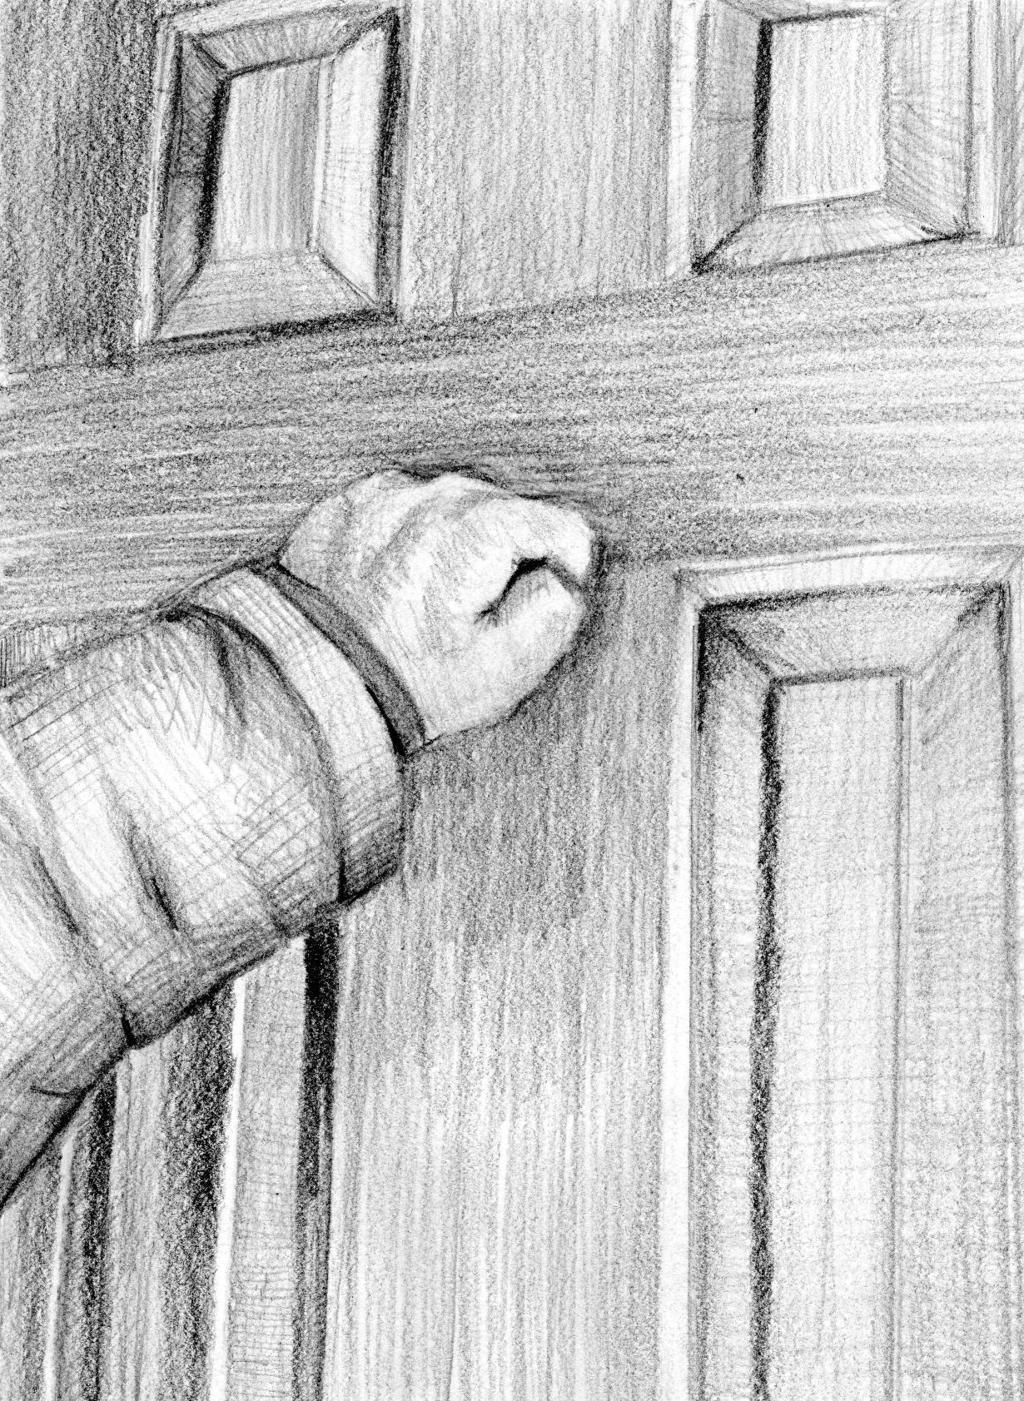 pulaski county missouri sex offender registry